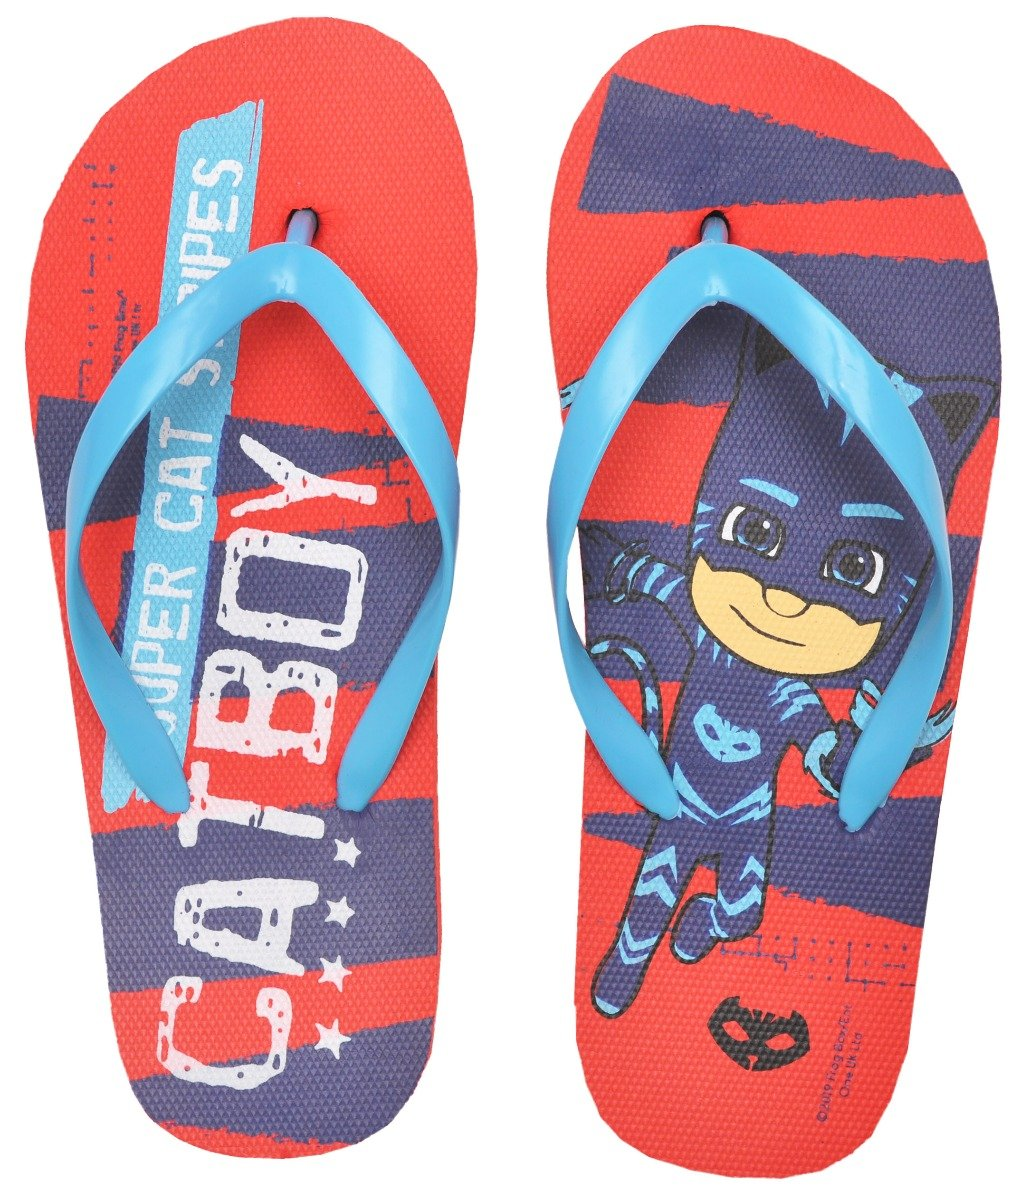 Papuci de plaja cu imprimeu Pj Masks, Blue